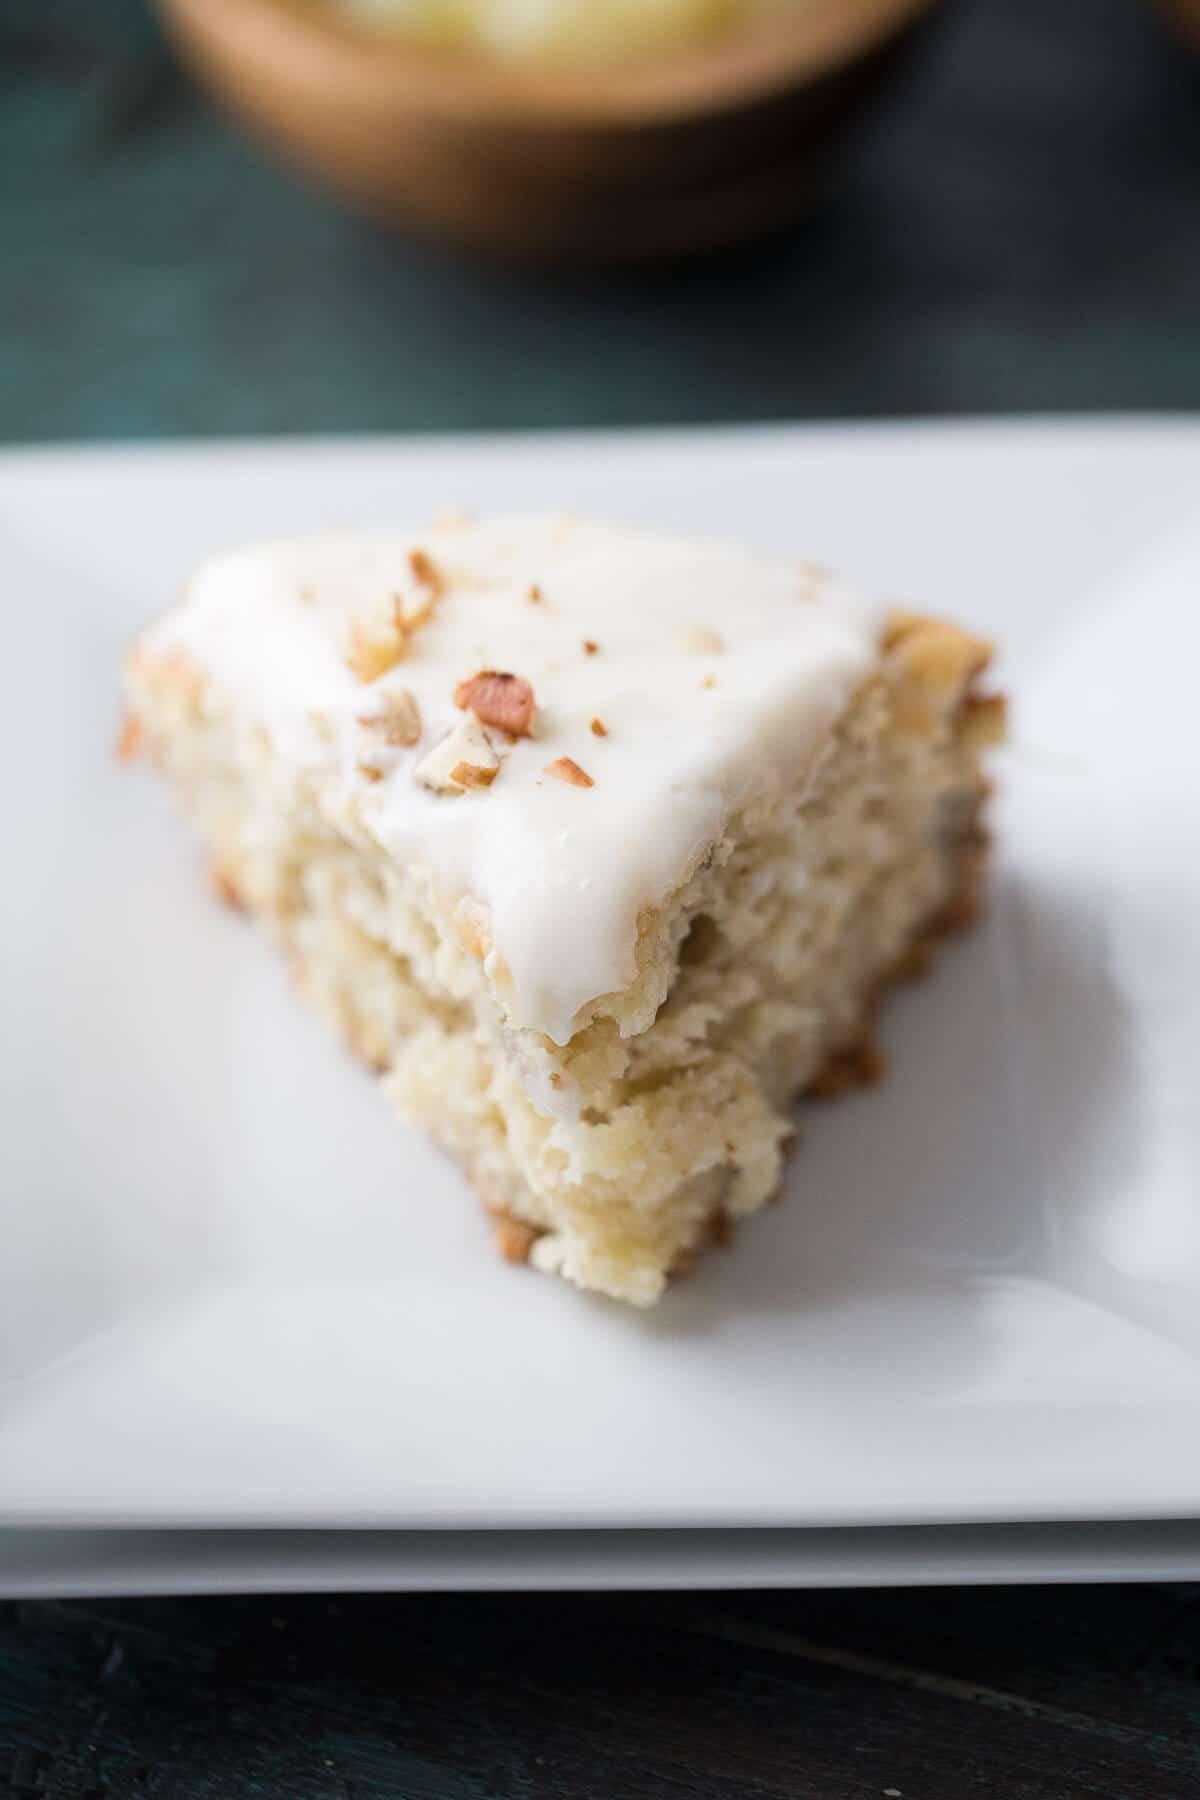 A simple coffee cake that imitates the classic hummingbird cake recipe!